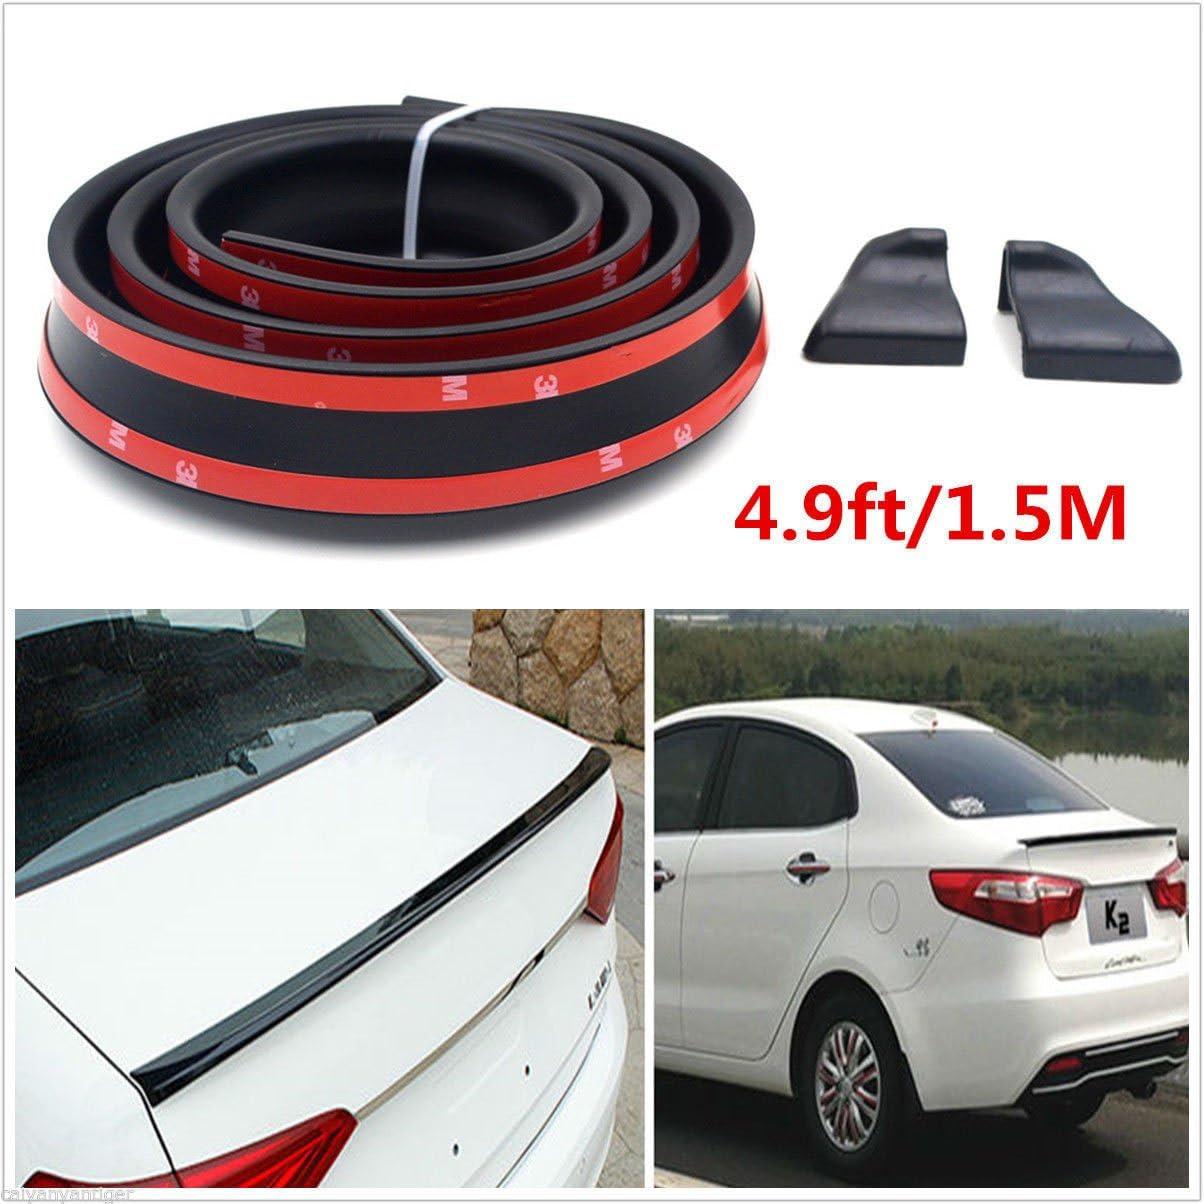 1.5m Black Soft Rubber Autos Rear Spoiler Wing Lip Trim Sticker Protector Cover